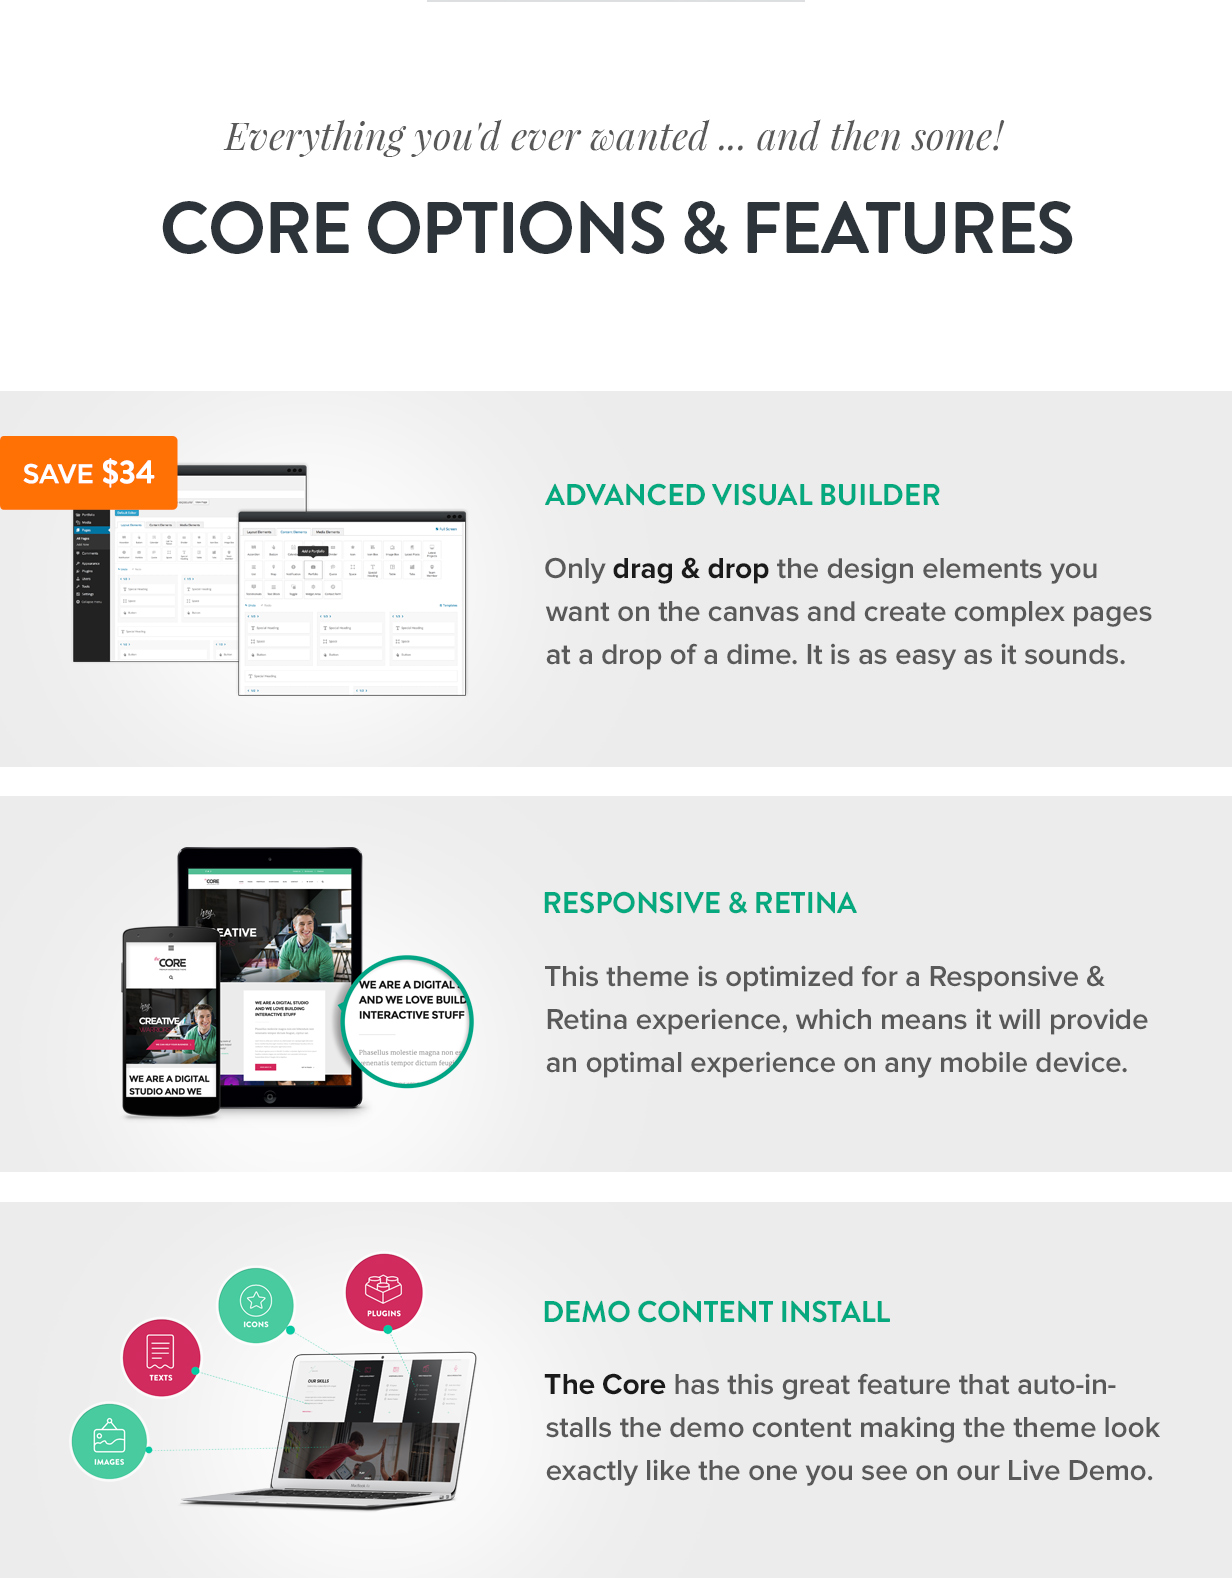 features1.jpg